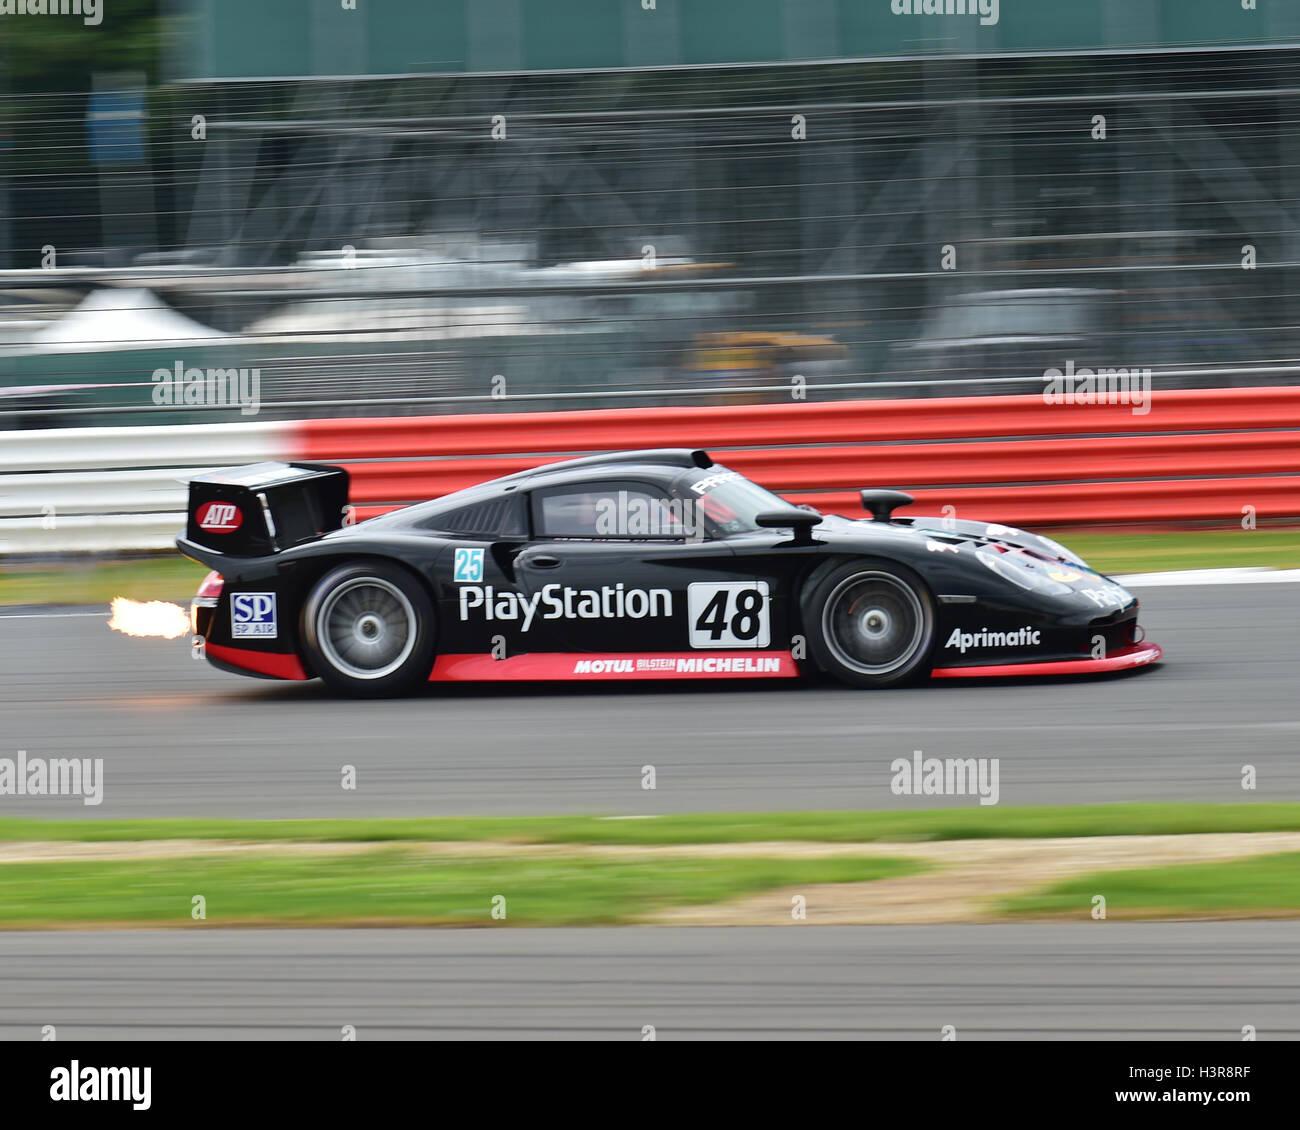 Mclaren Exhaust Flames Silverstone Classic S Cars